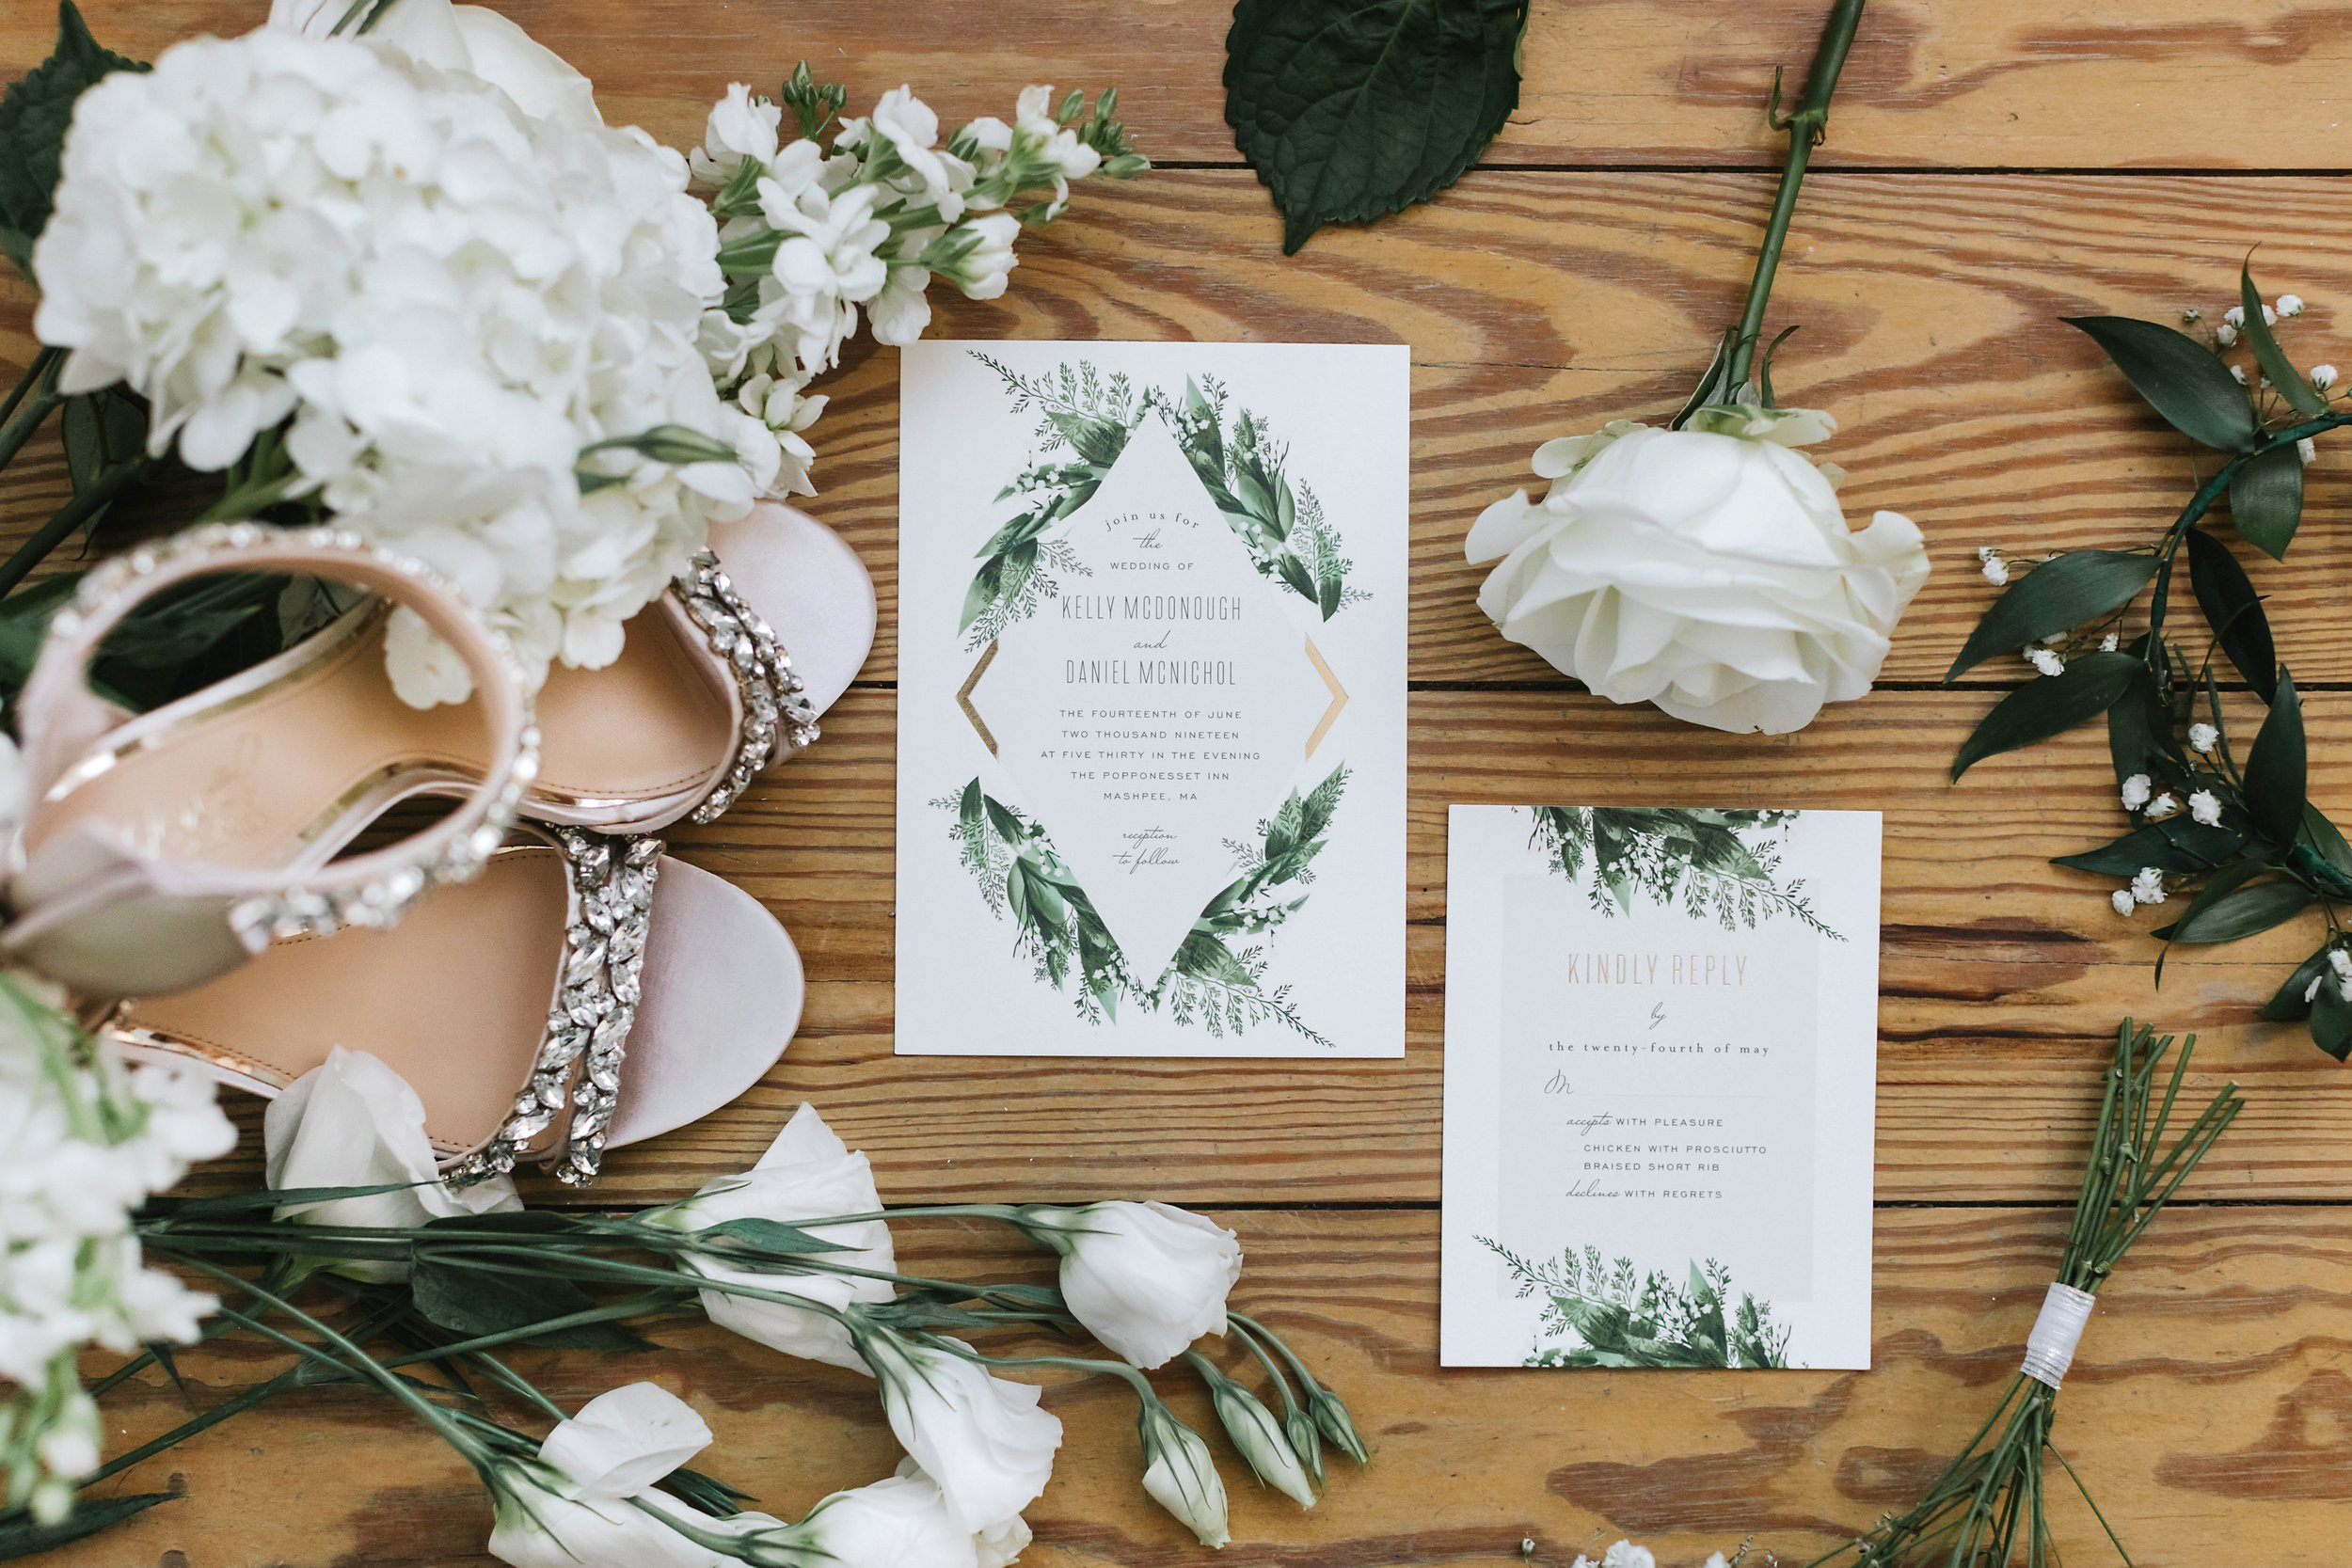 Popponesset-Inn-Wedding-Cape-Cod-Lena-Mirisola-Photography-1.jpg